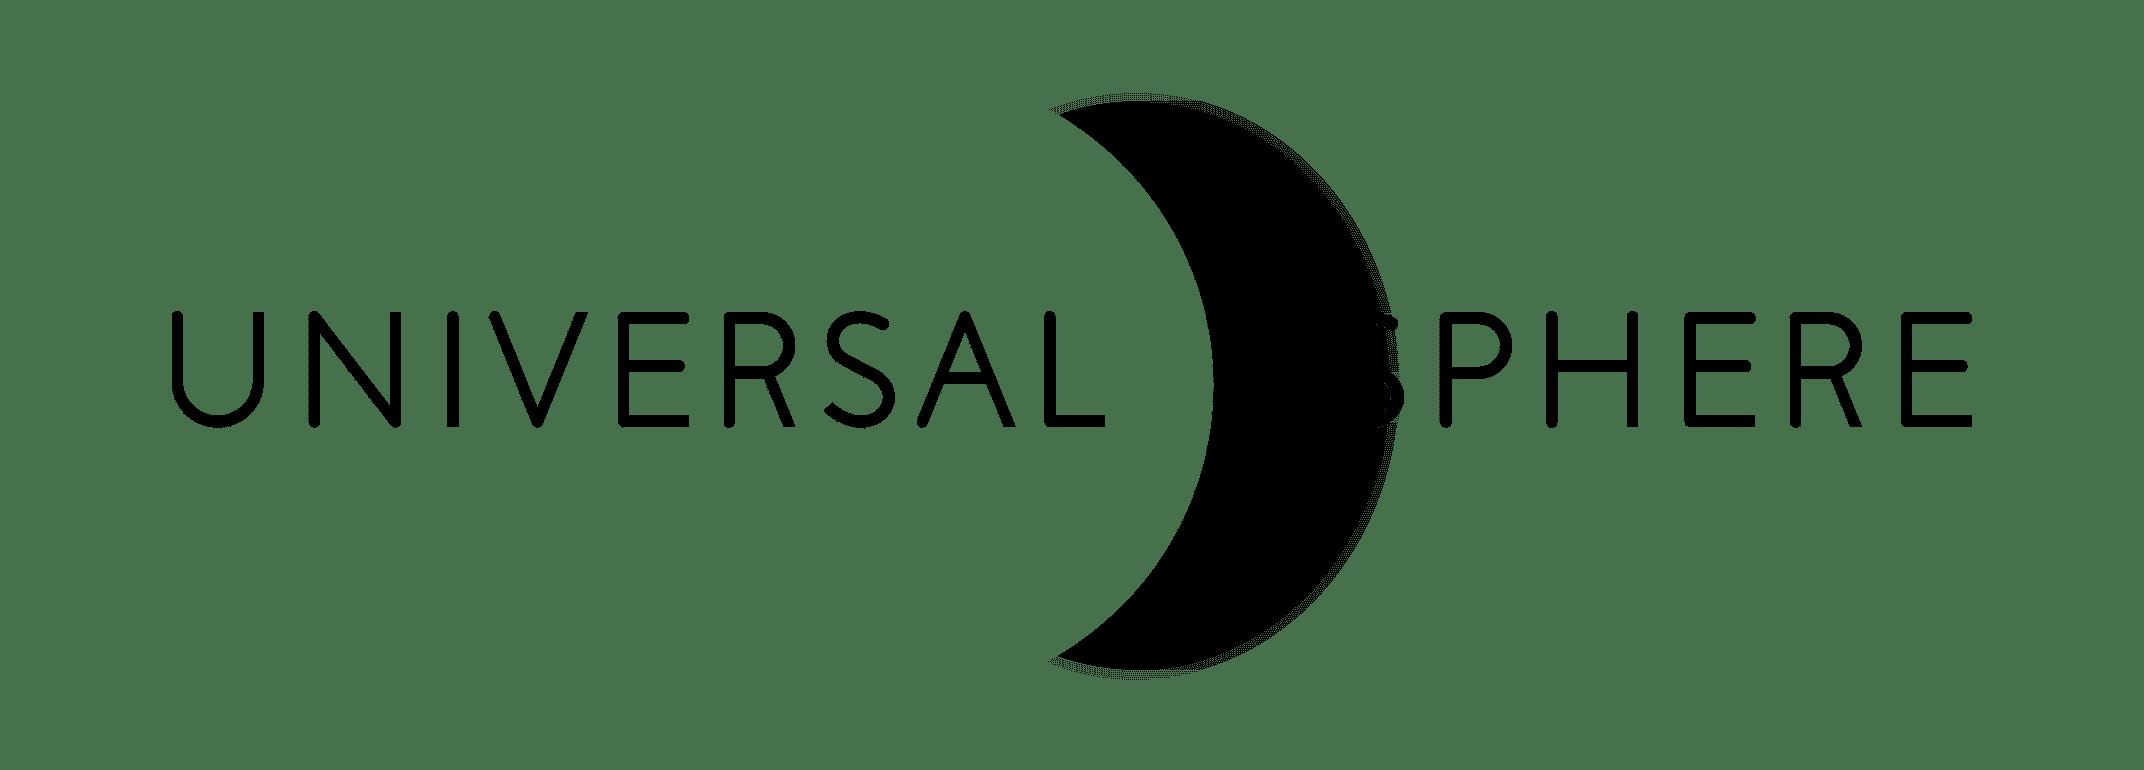 The Universal Sphere™ logo